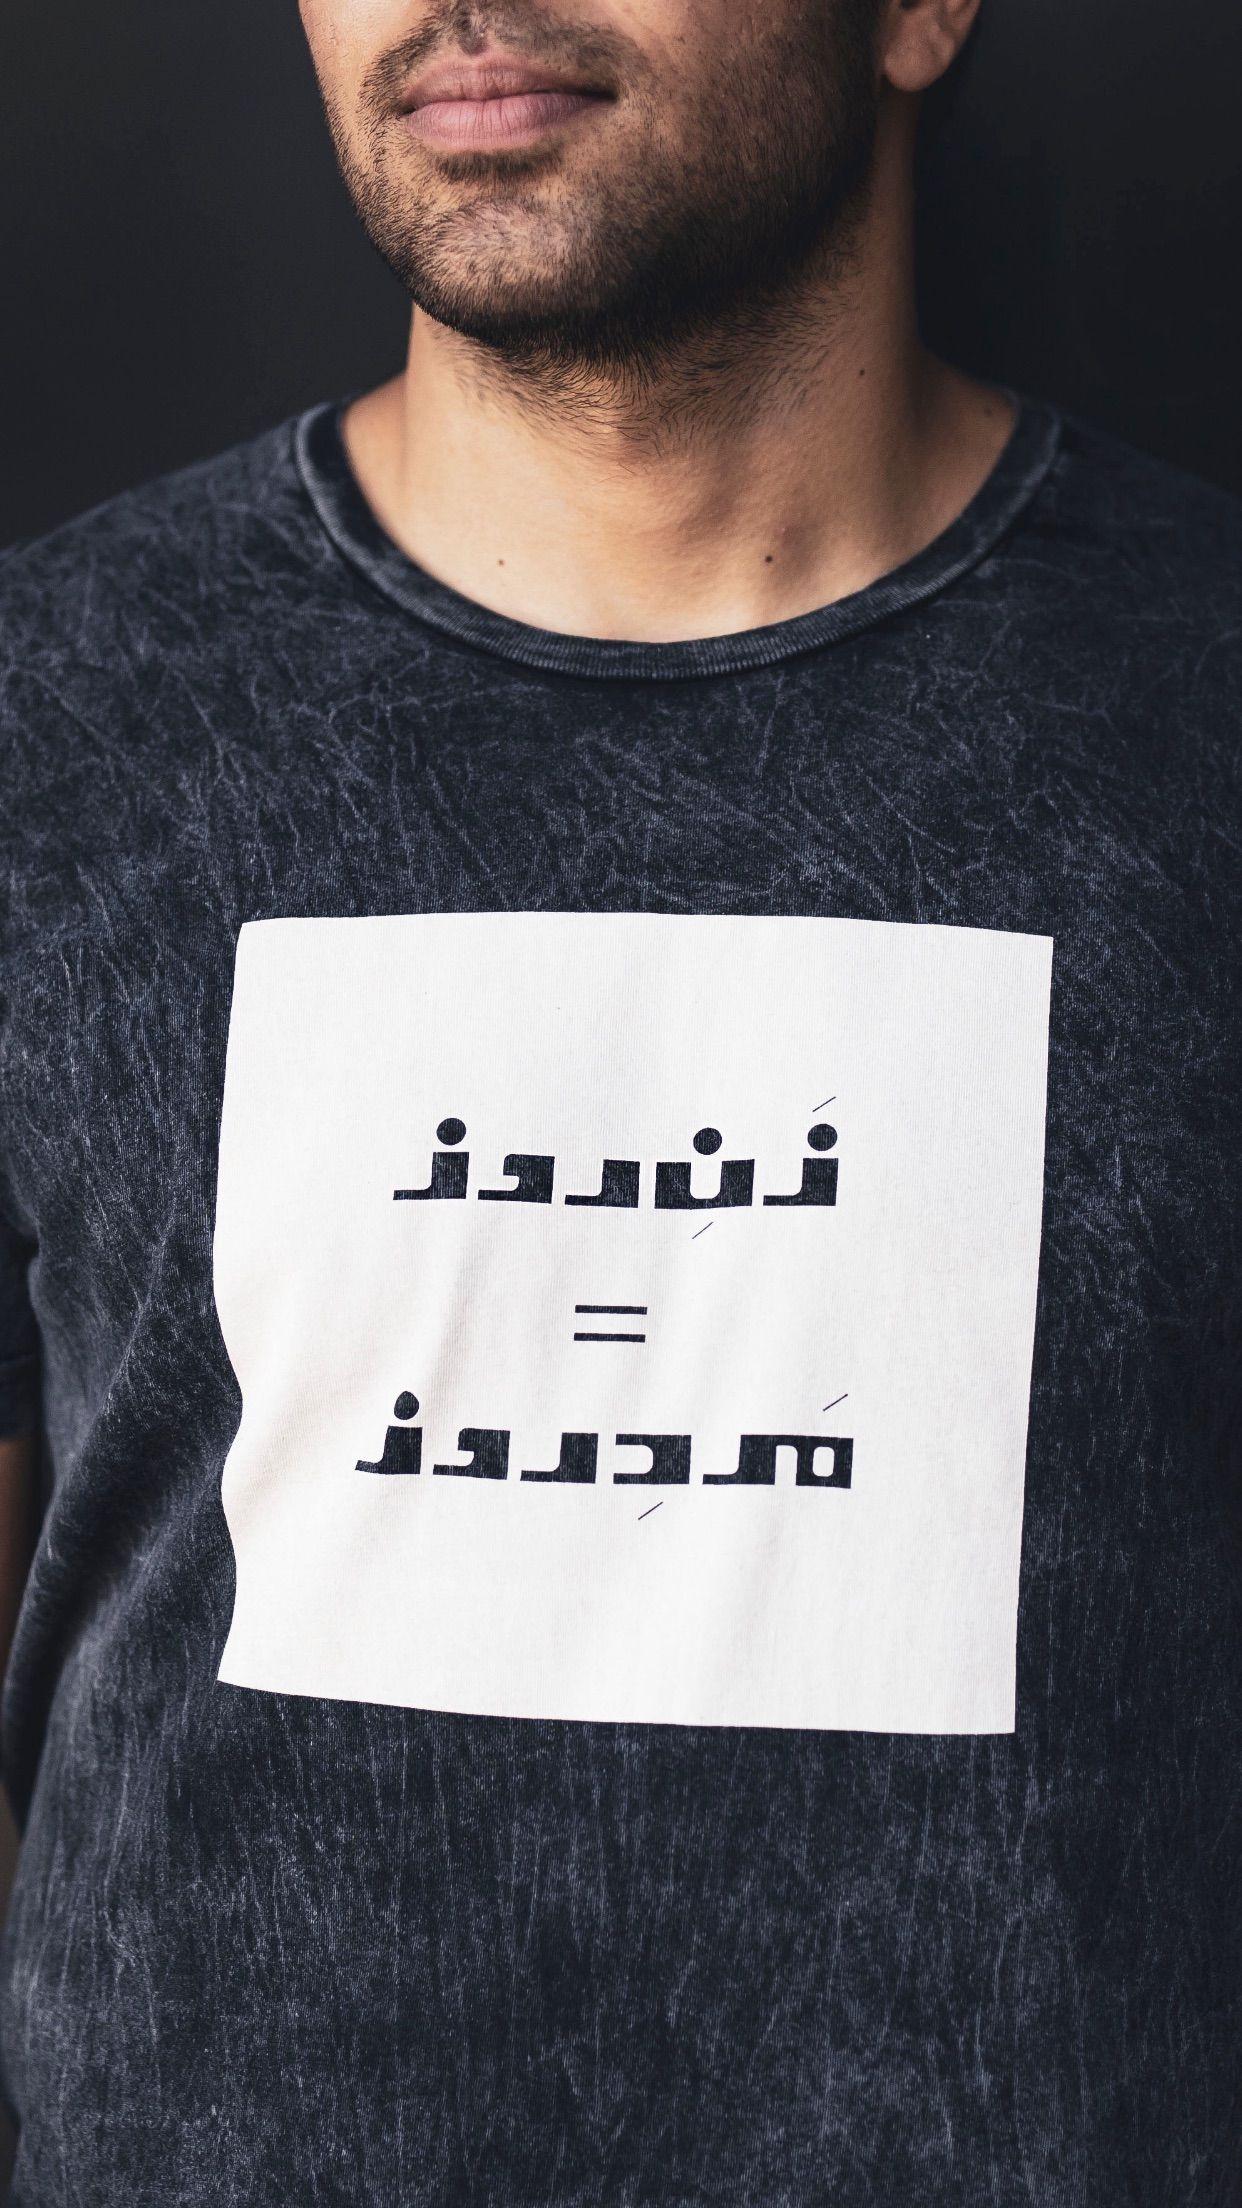 Persian Design Clothing & Apparel GEEV Persian fashion